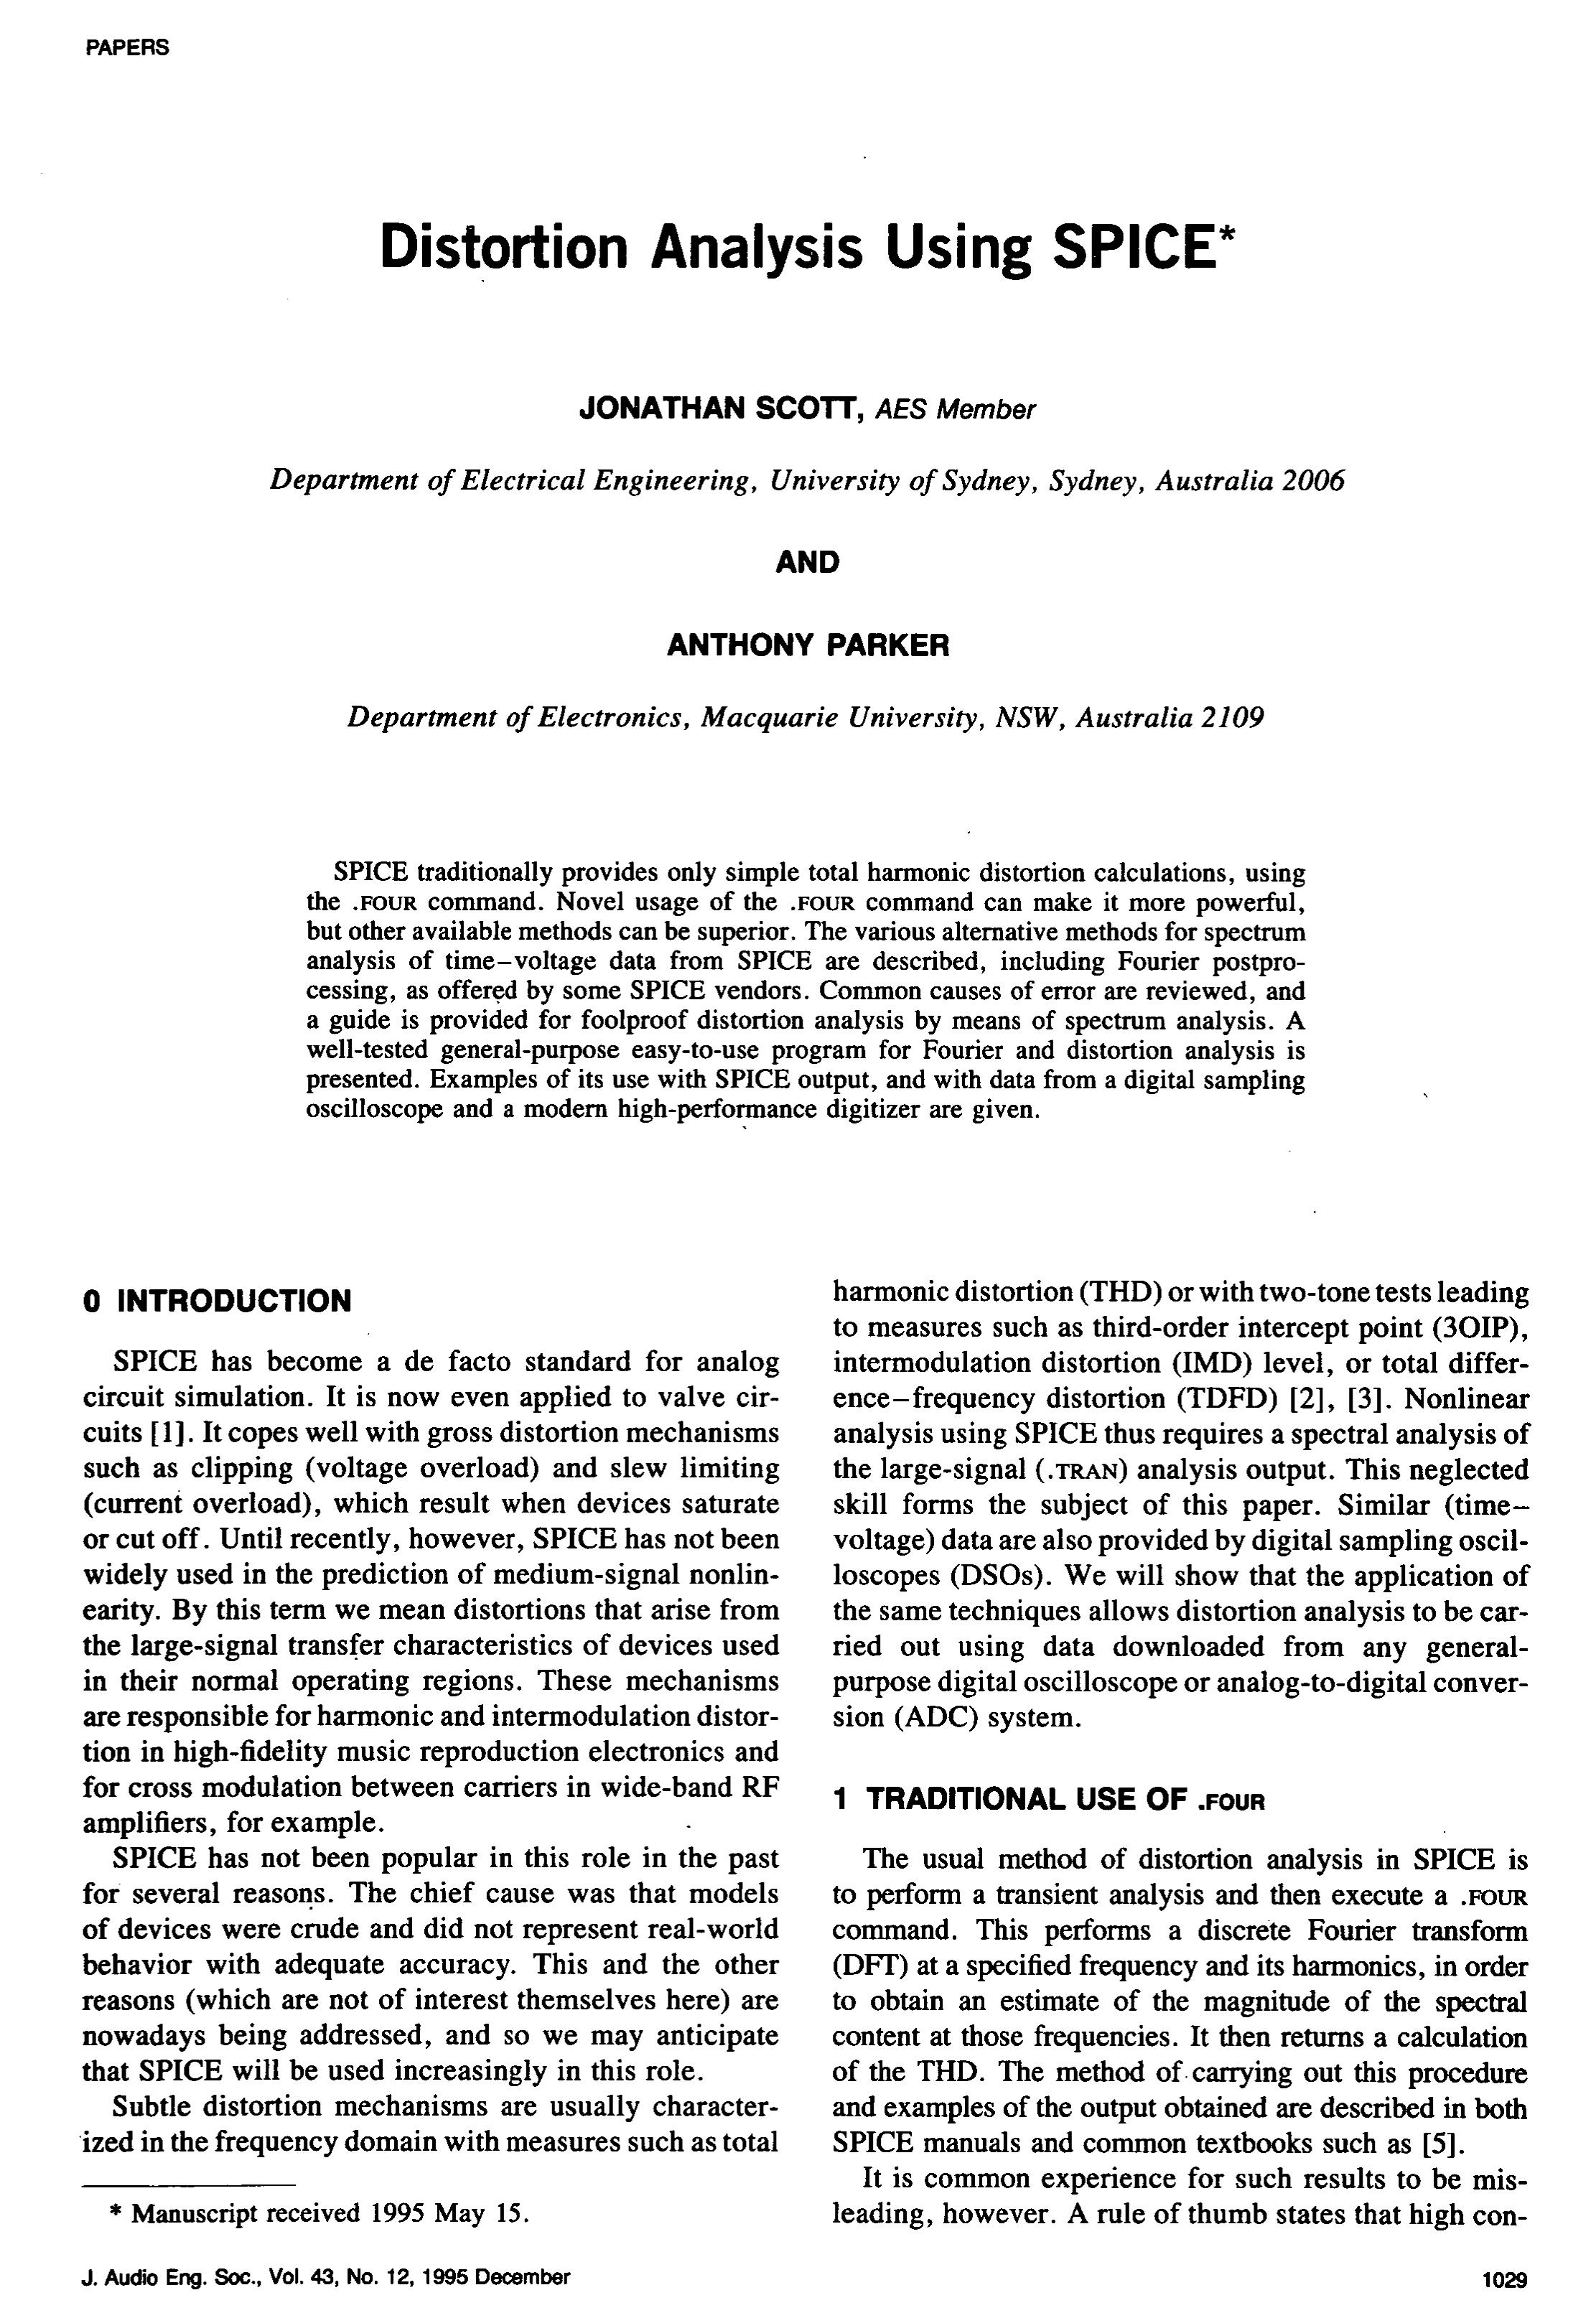 Aes E Library Distortion Analysis Using Spice Download Free Generalpurpose Circuit Simulation Program